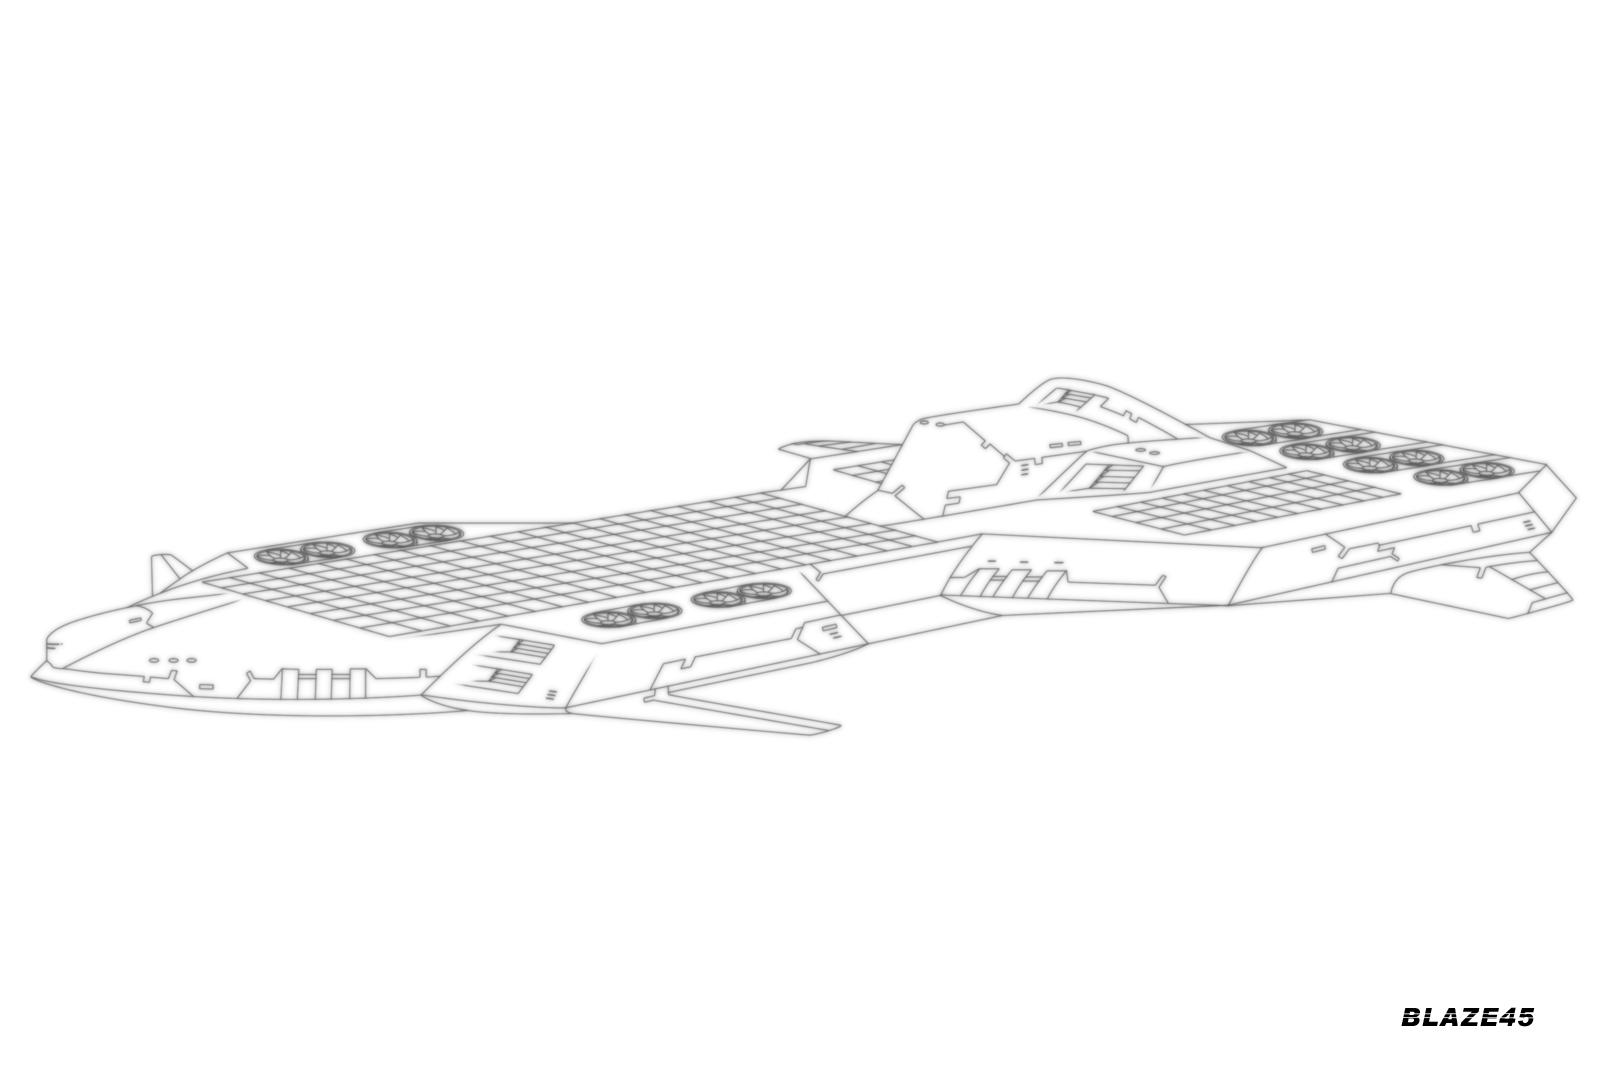 Ra Aircraft Concept Image